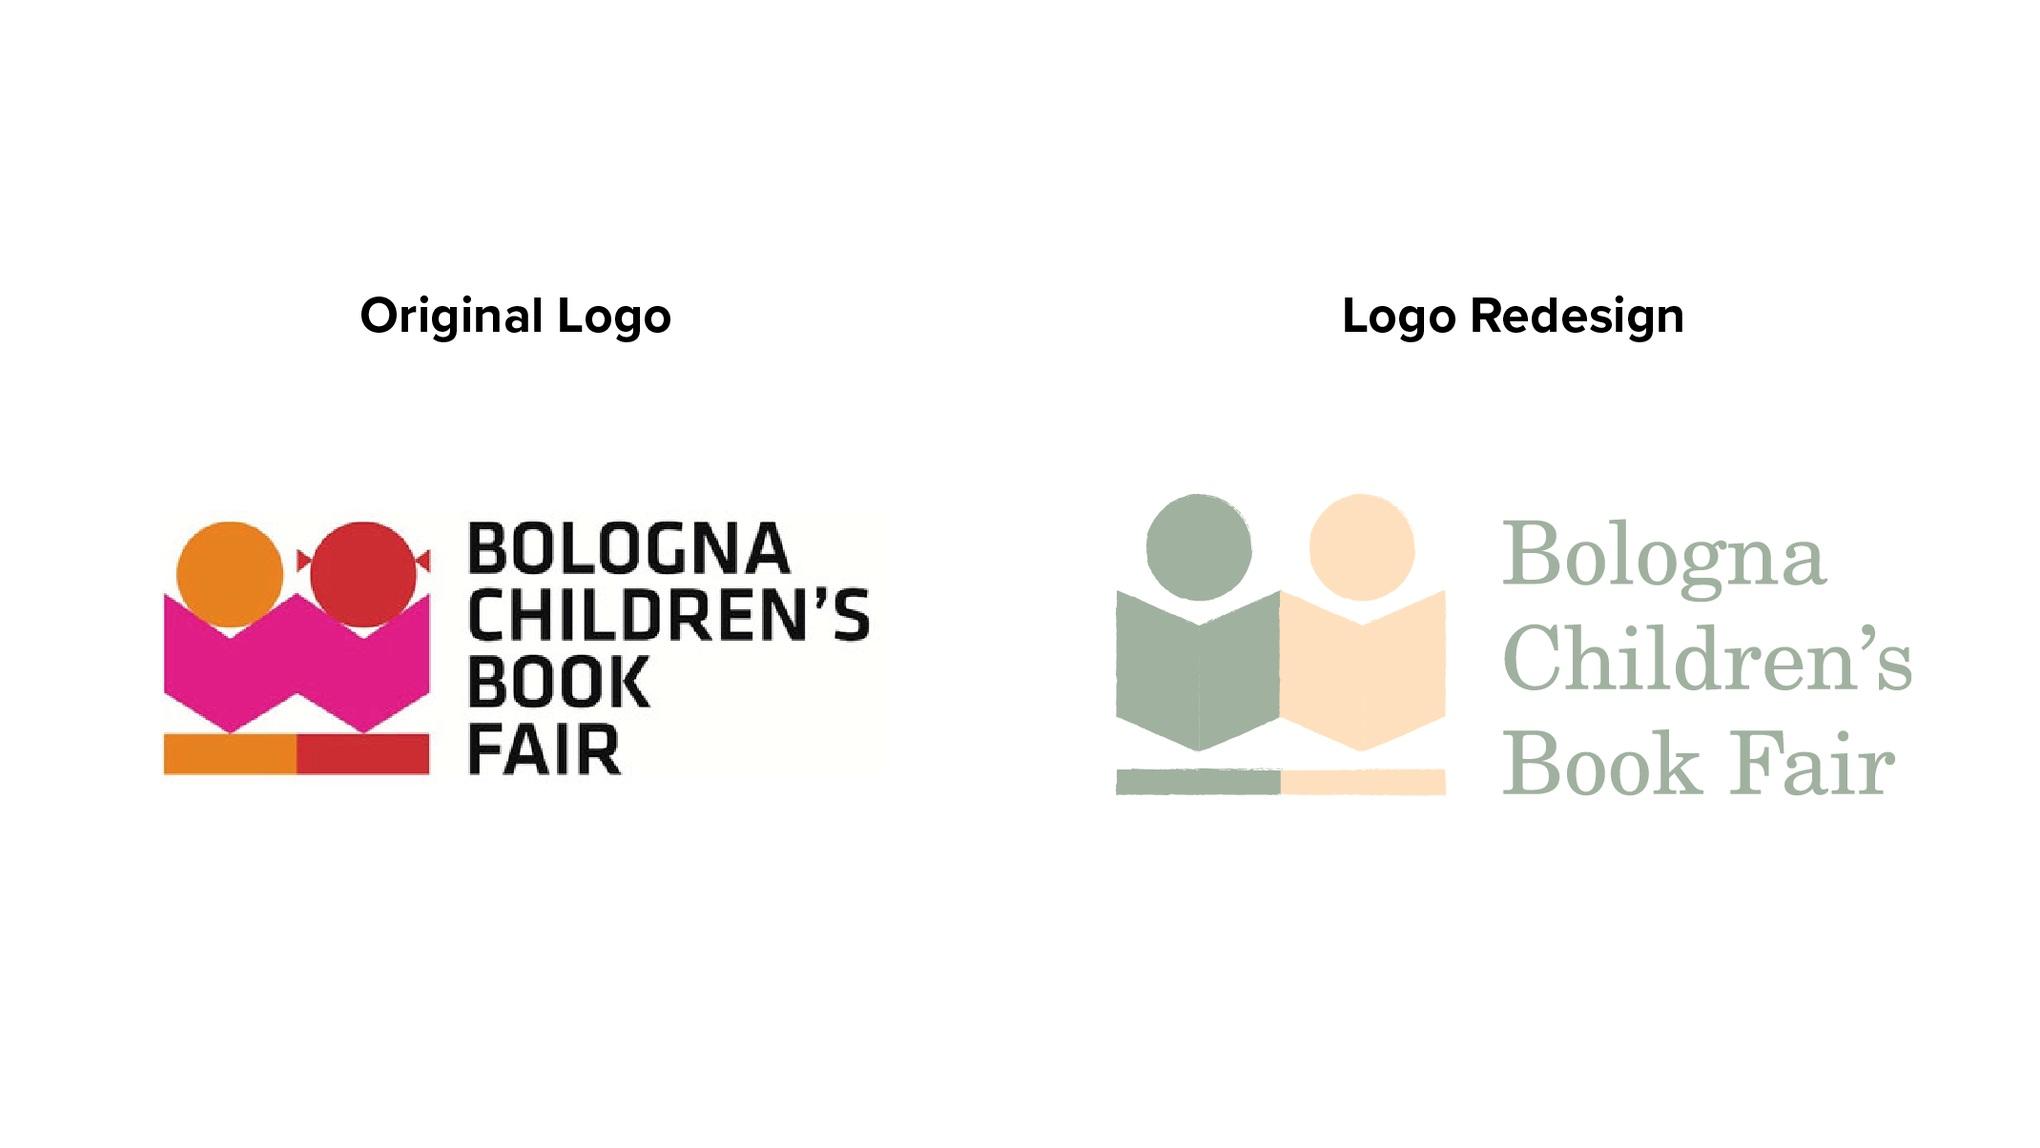 Logo-Comparison-01.jpg